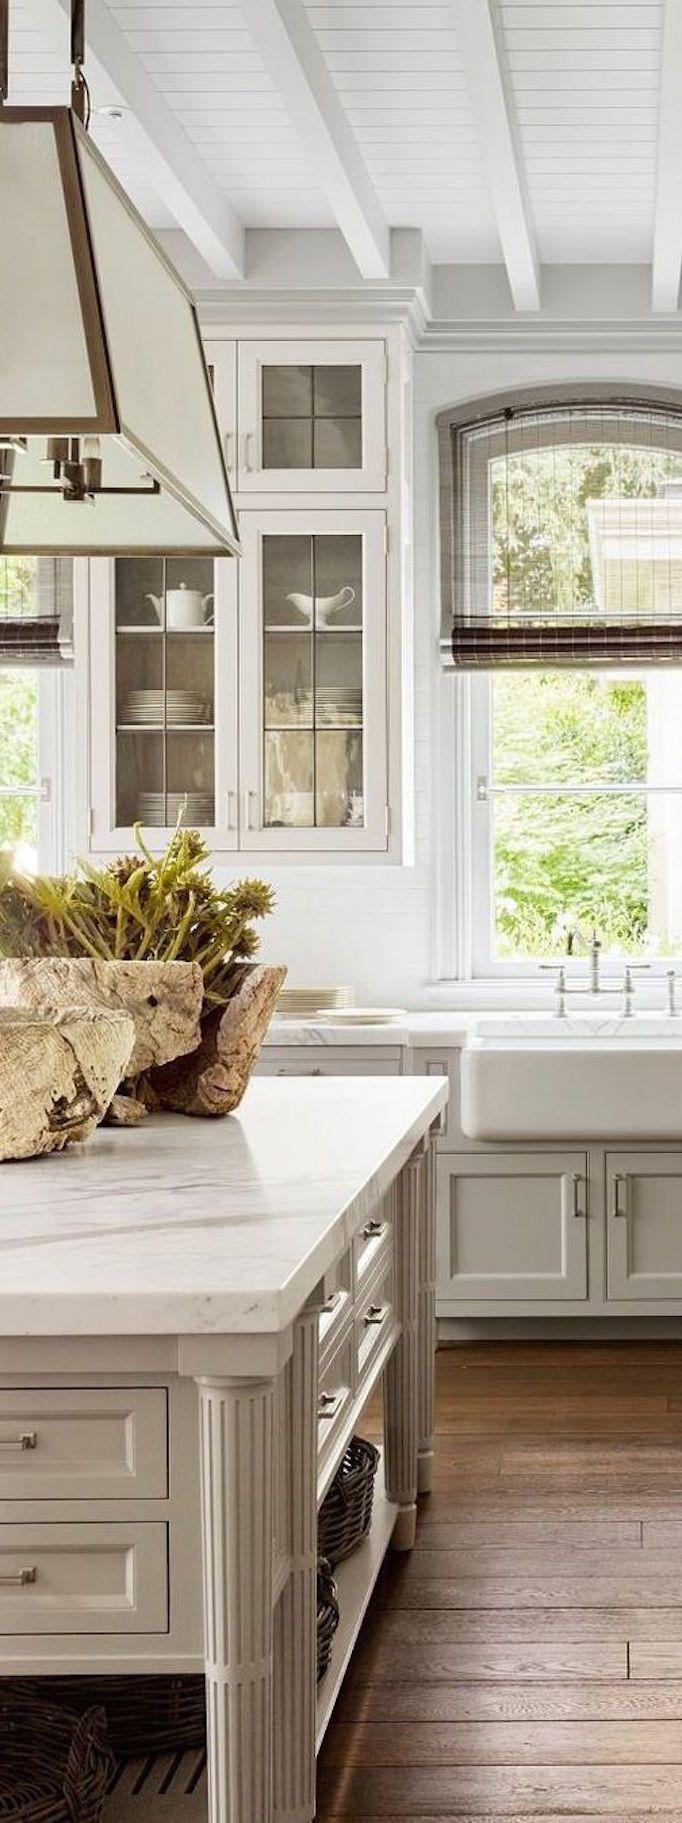 336 best #KitchenGoals images on Pinterest | Kitchen white, Kitchens ...